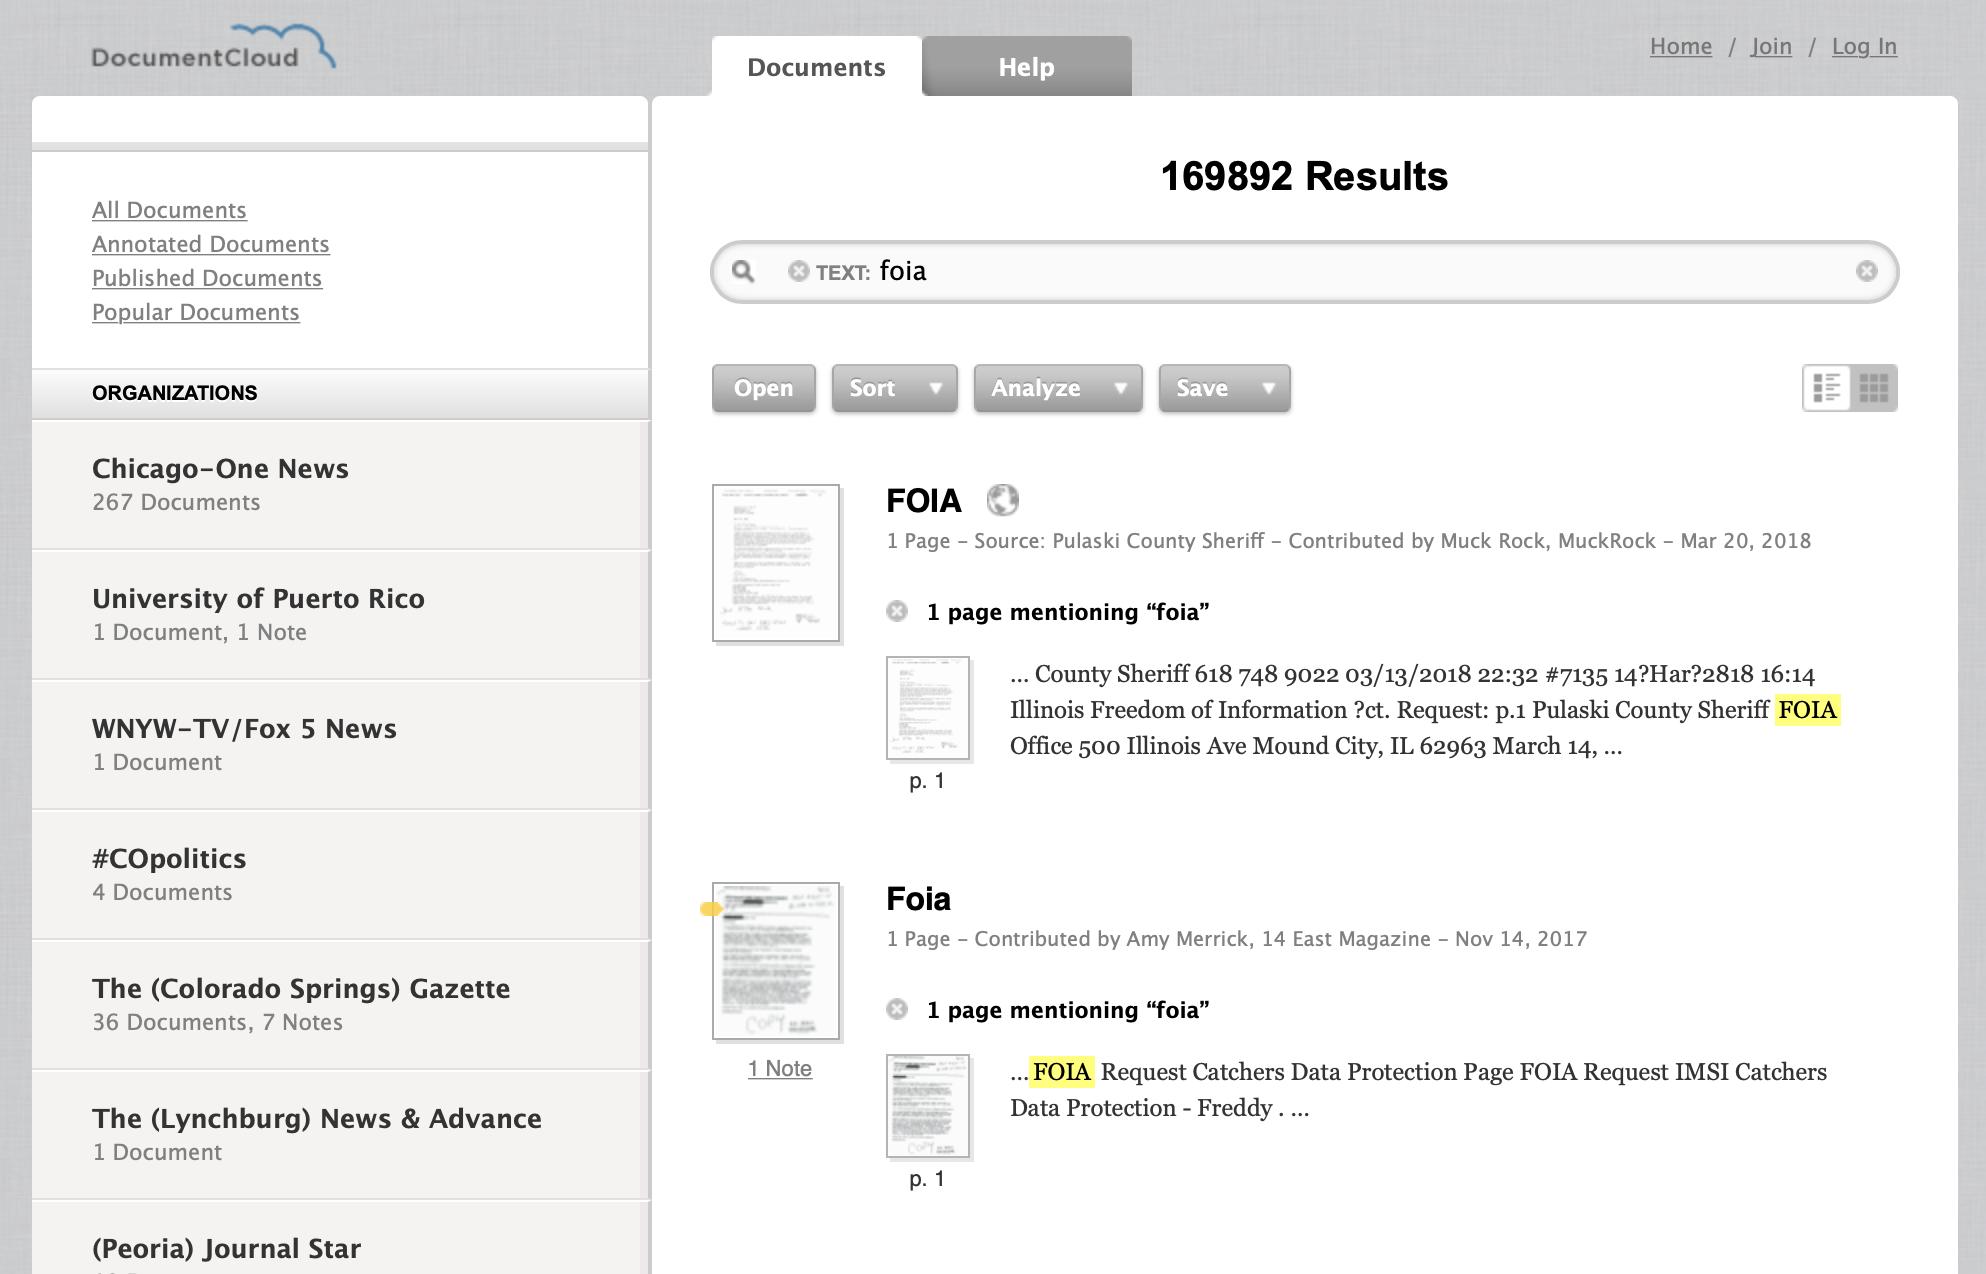 A screenshot of DocumentCloud's search interface